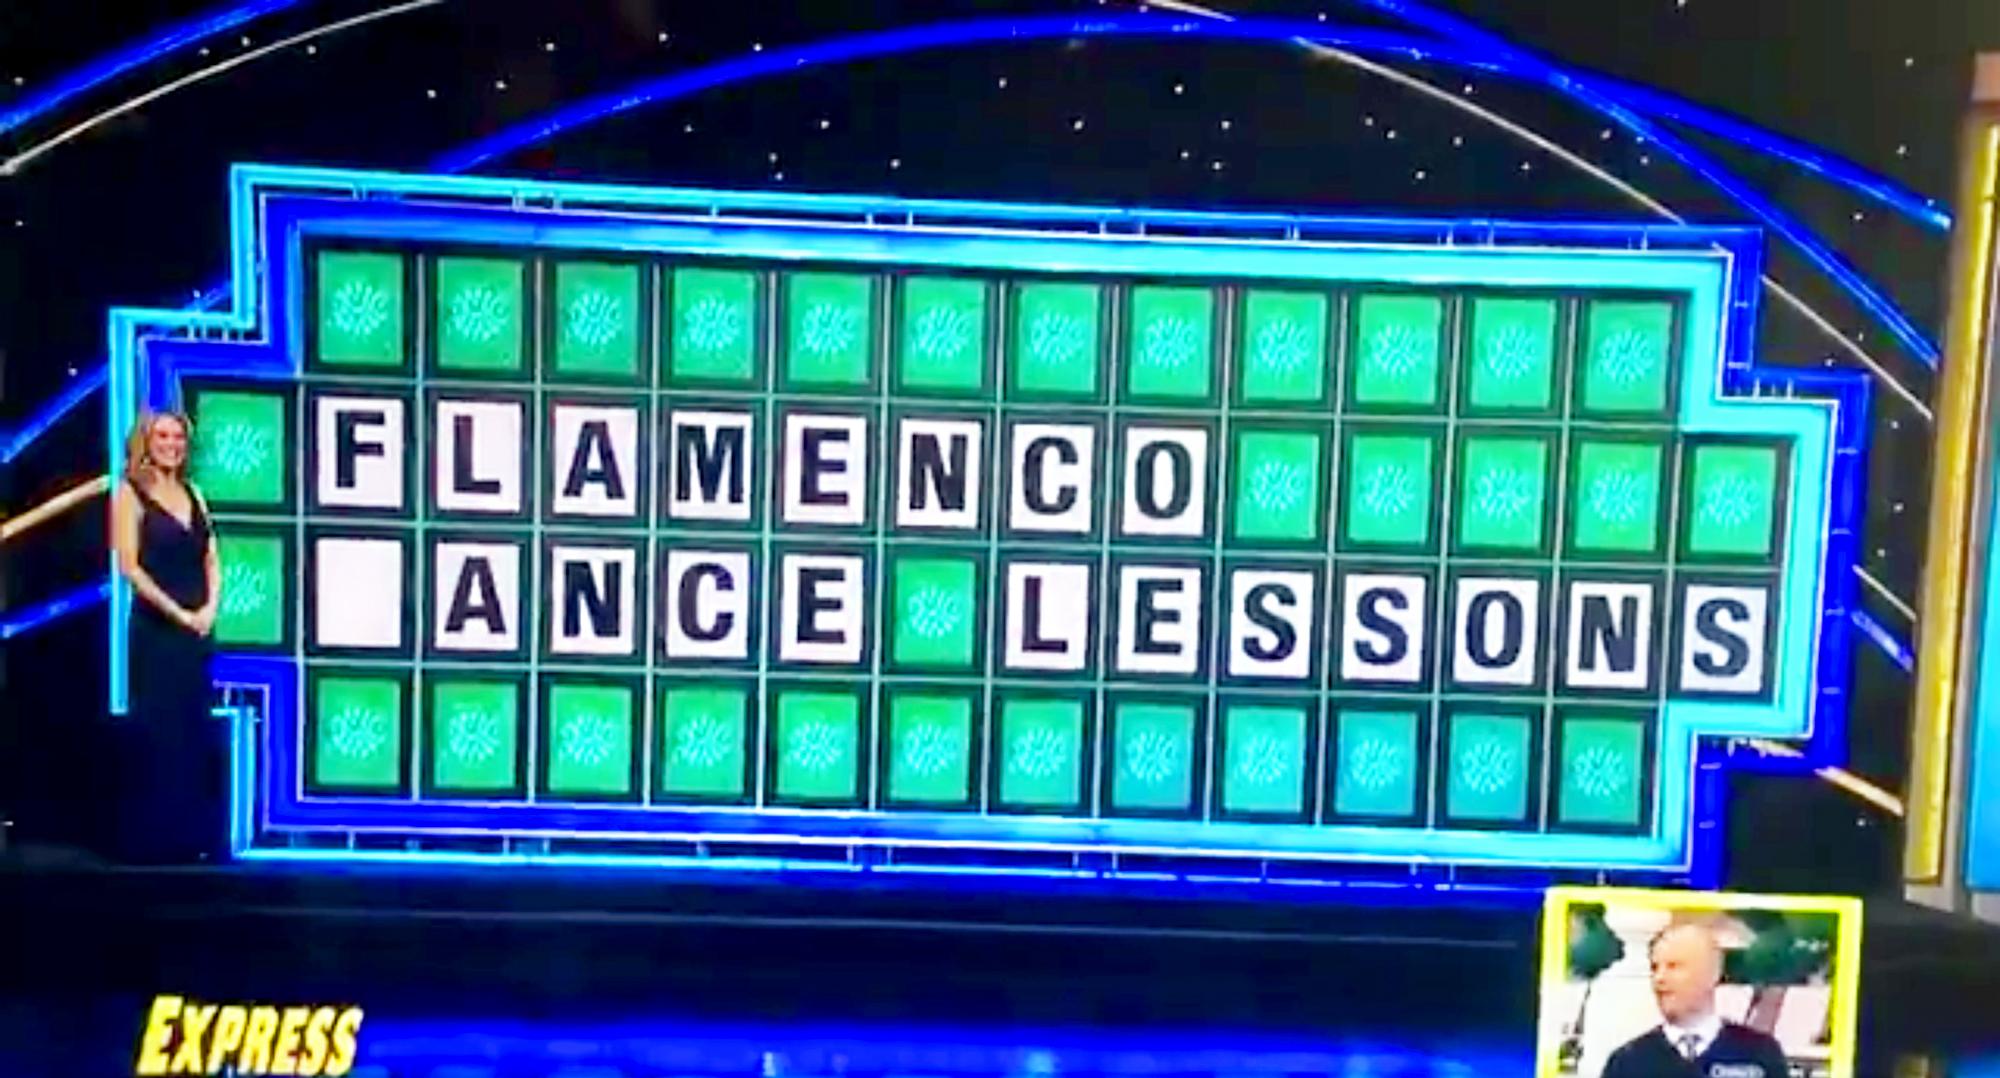 Wheel of Misfortune: Apex man loses $7k after mispronouncing 'flamenco'